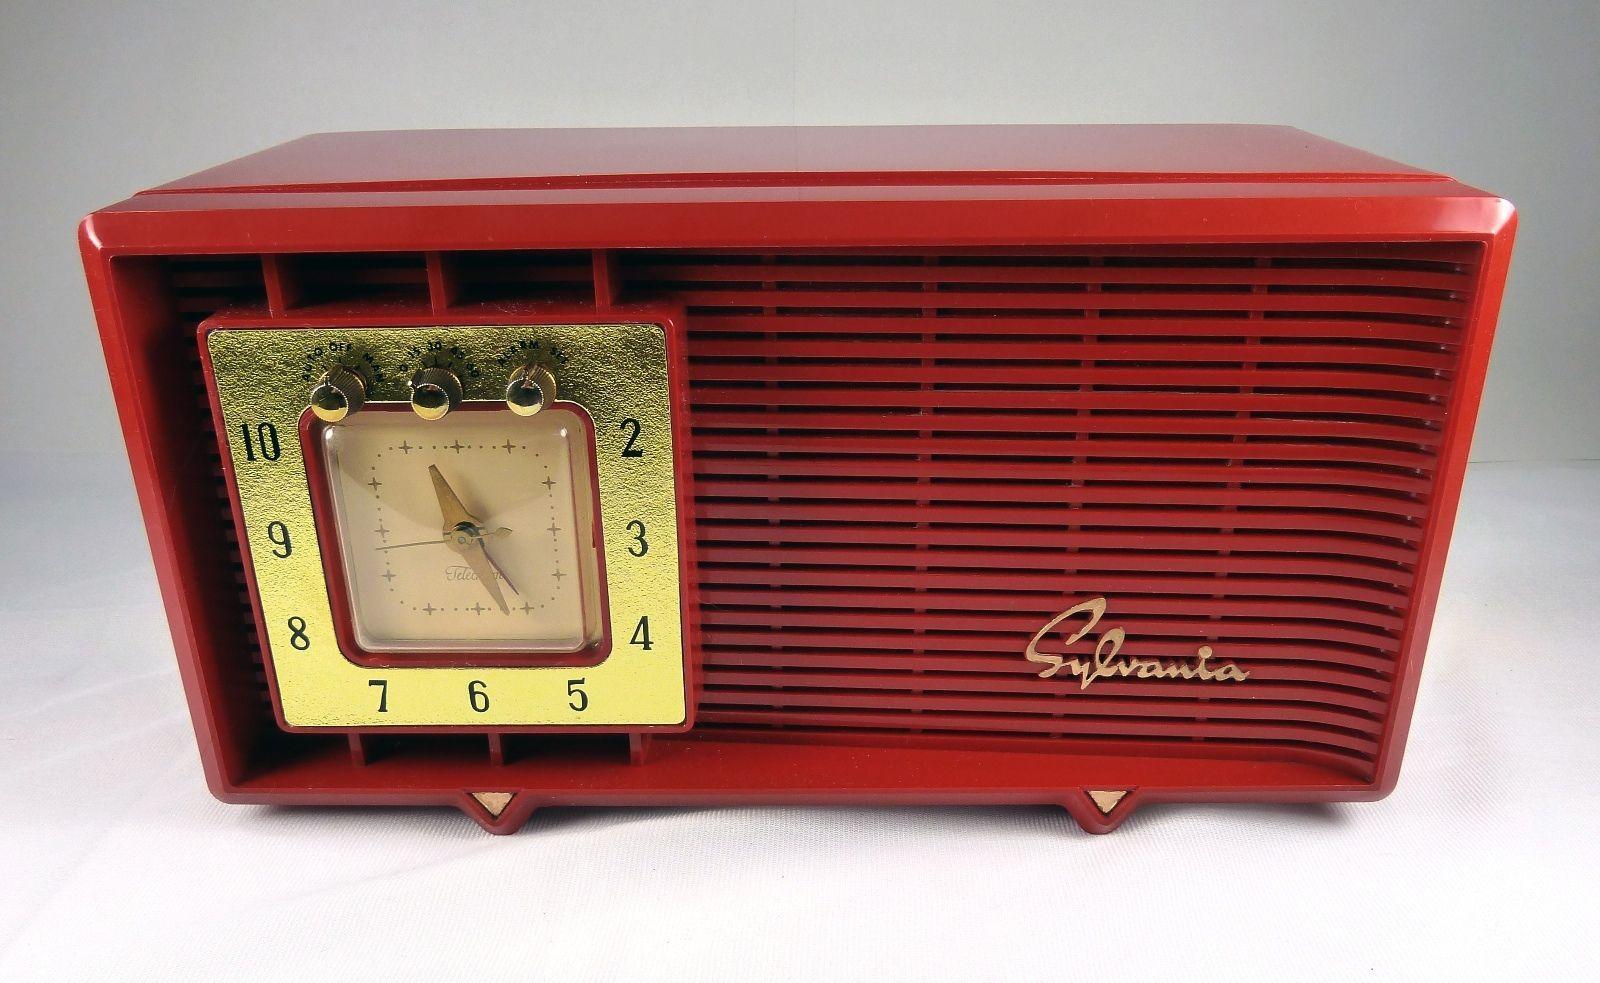 Restored Vintage Sylvania 5484 Antique Tube Clock Radio Ravishing Red Vintage Radio Retro Radios Antique Radio